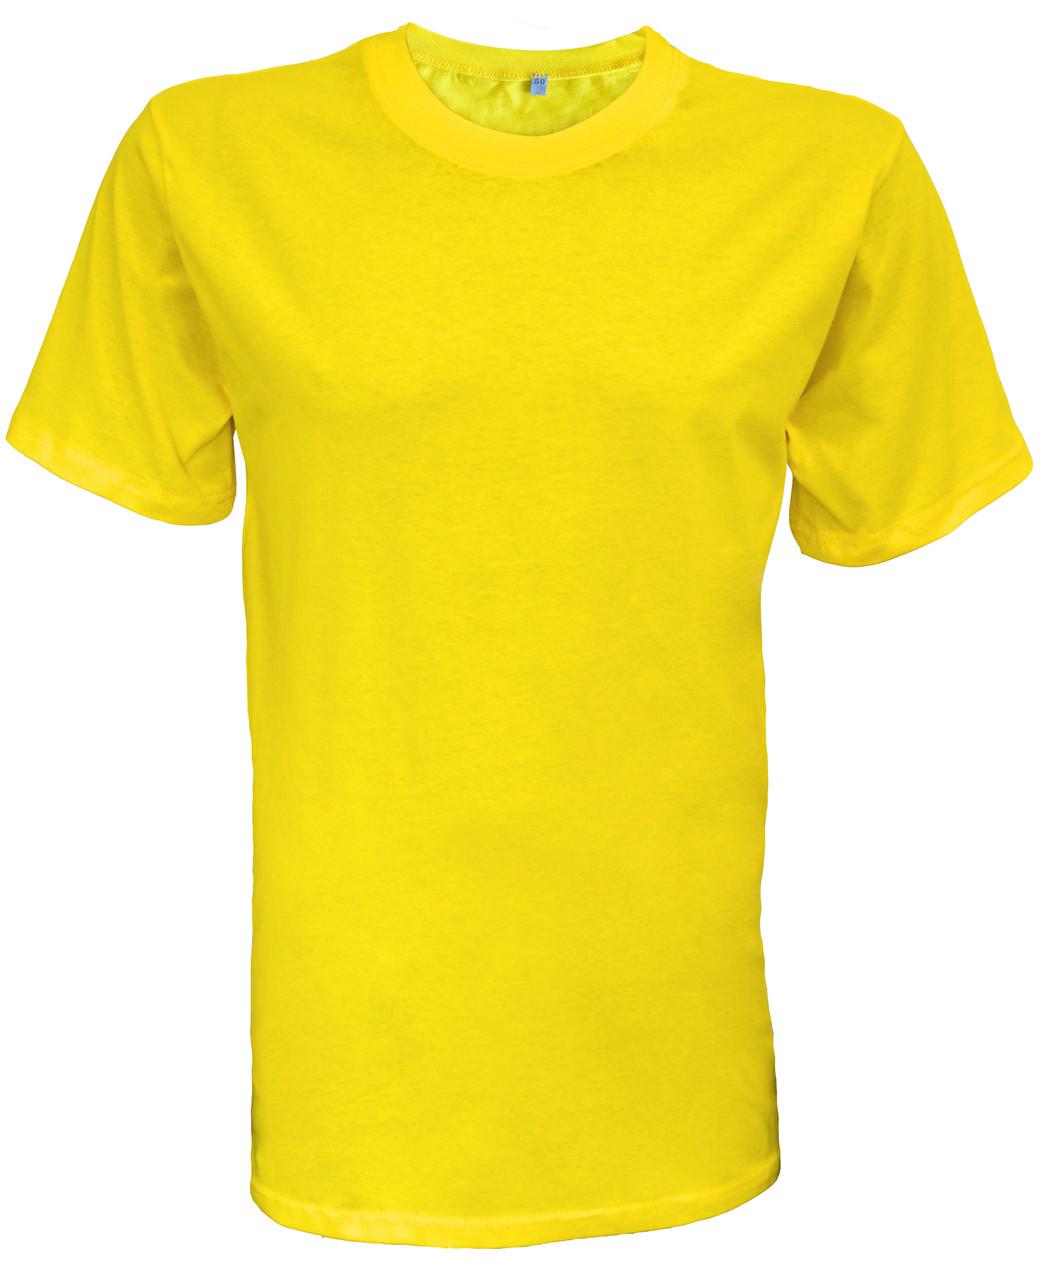 Футболки желтые